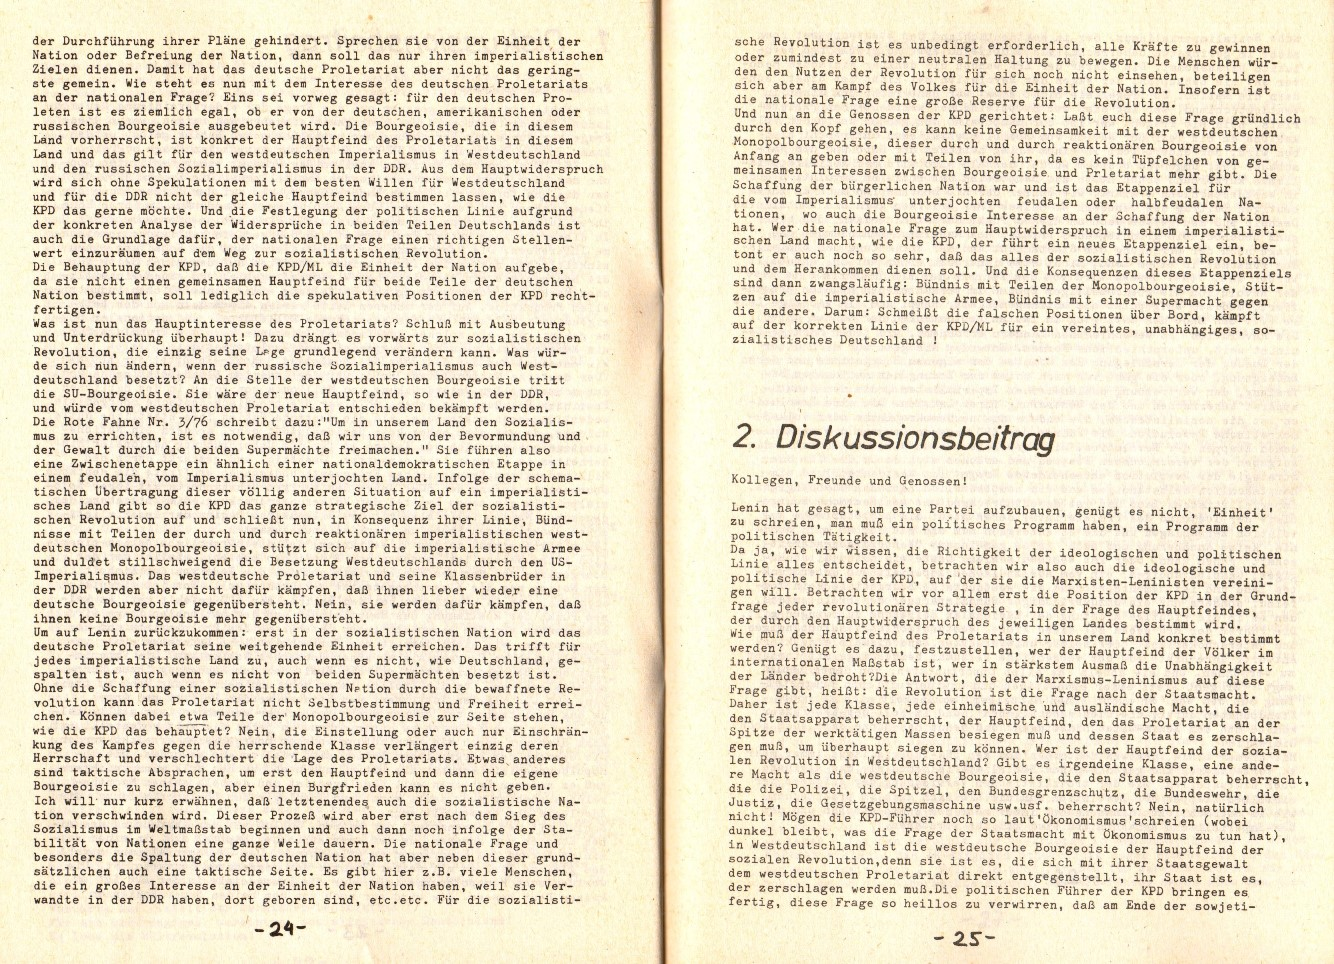 Berlin_AO_1976_Veranstaltung_mit_KPDML_13